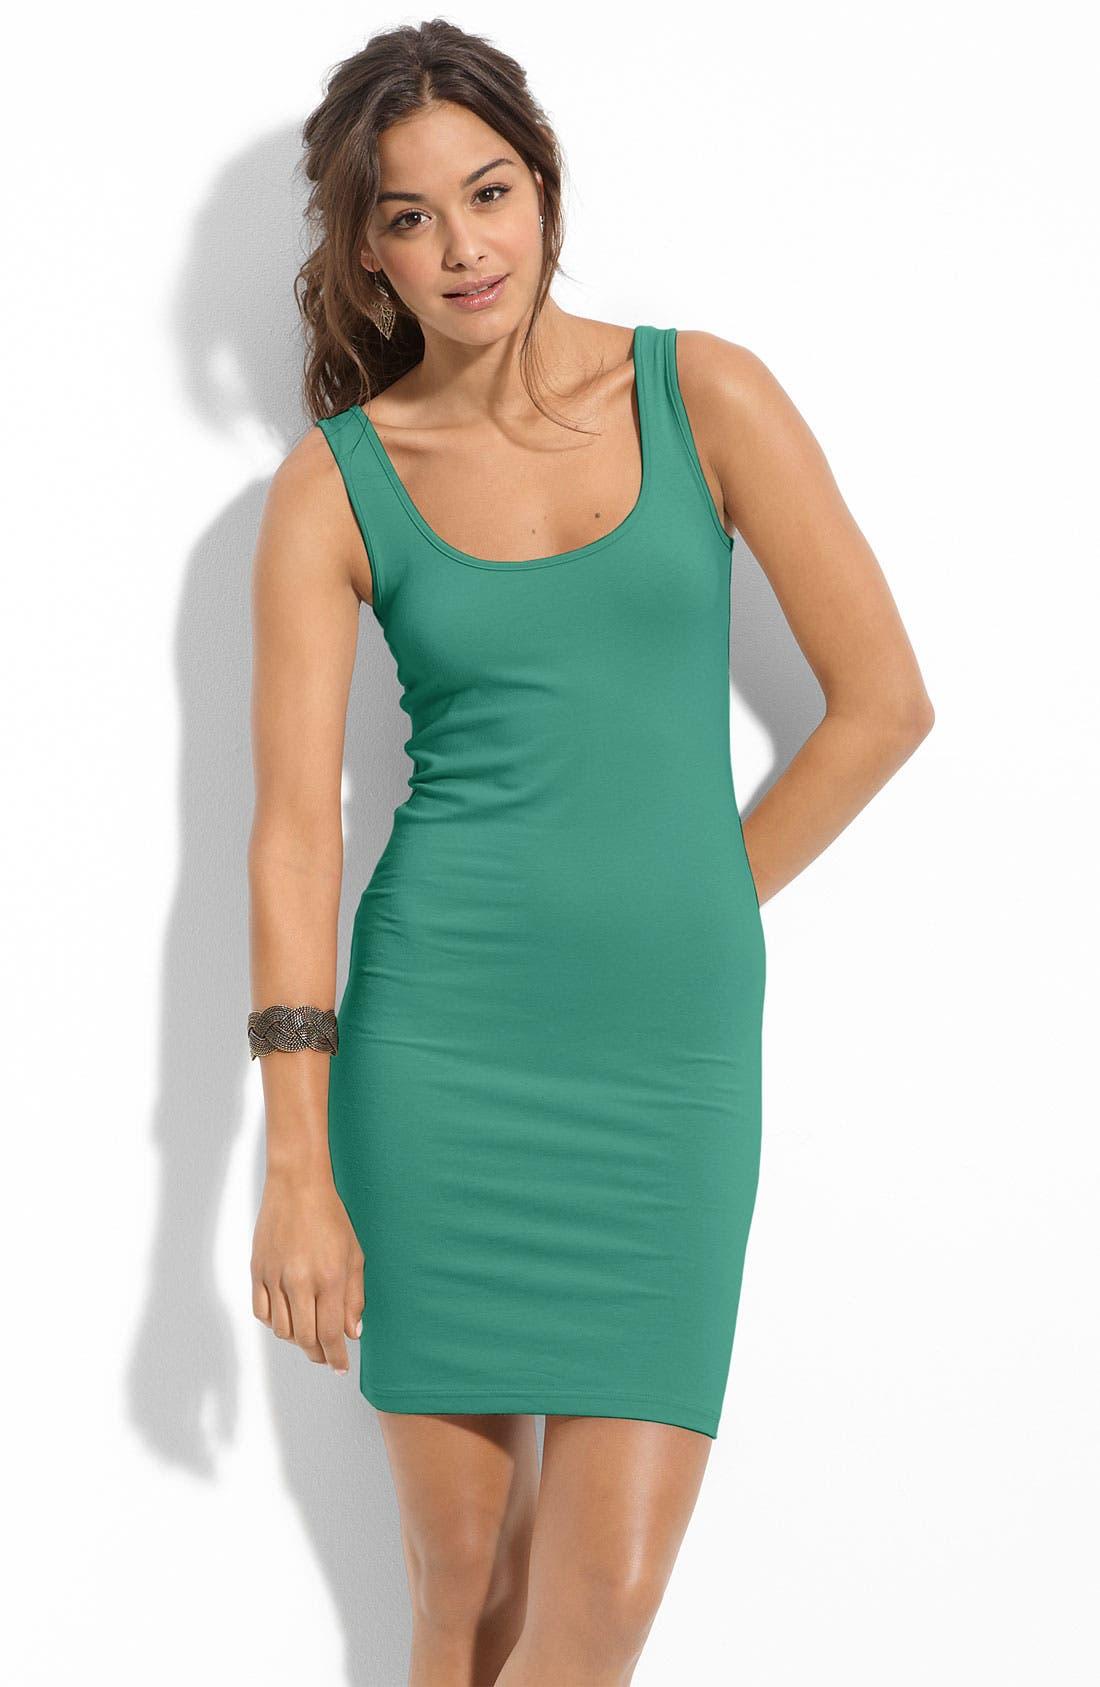 Alternate Image 1 Selected - BP. Double Scoop Tank Dress (Juniors)